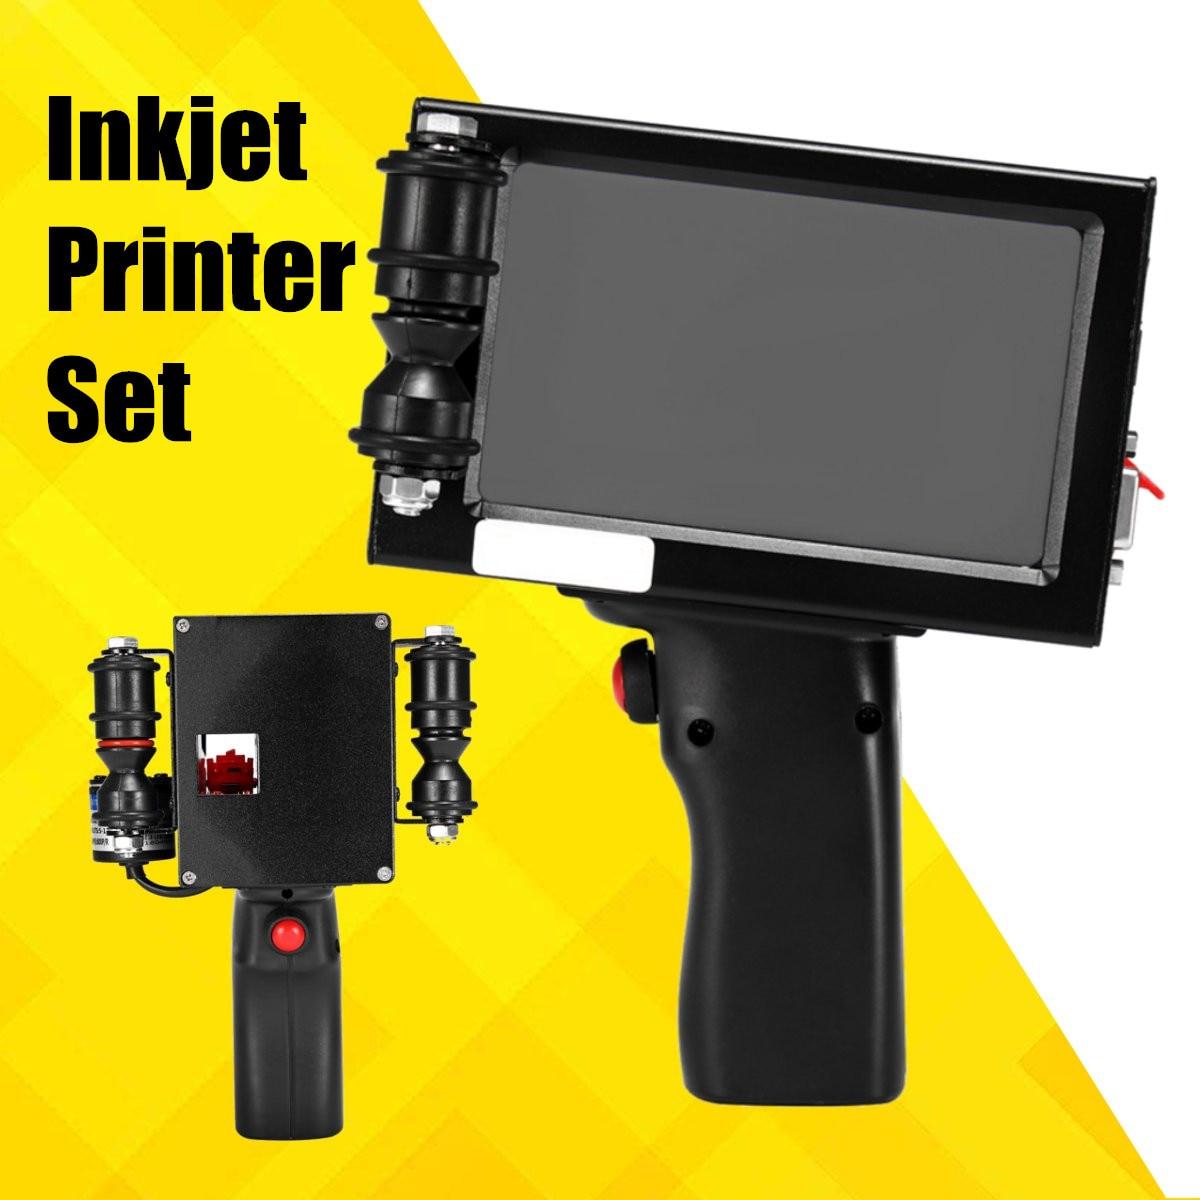 600DPI Label Printer LED Screen Intelligent Inkjet Printer Handheld Spray Coding Machine Portable Bar QR Code Inkjet Printer